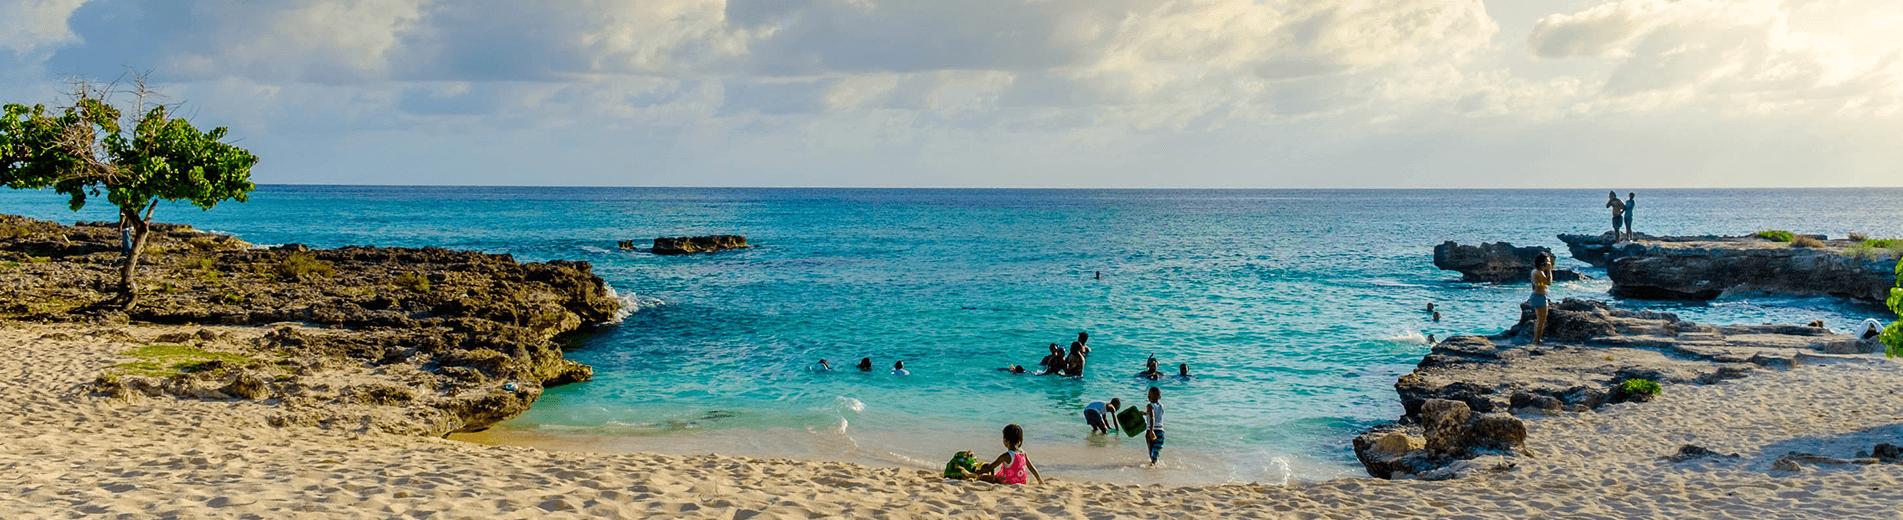 Three islands, one destination, endless enjoyment, find your Caymankind with a Cayman Islands getaway.